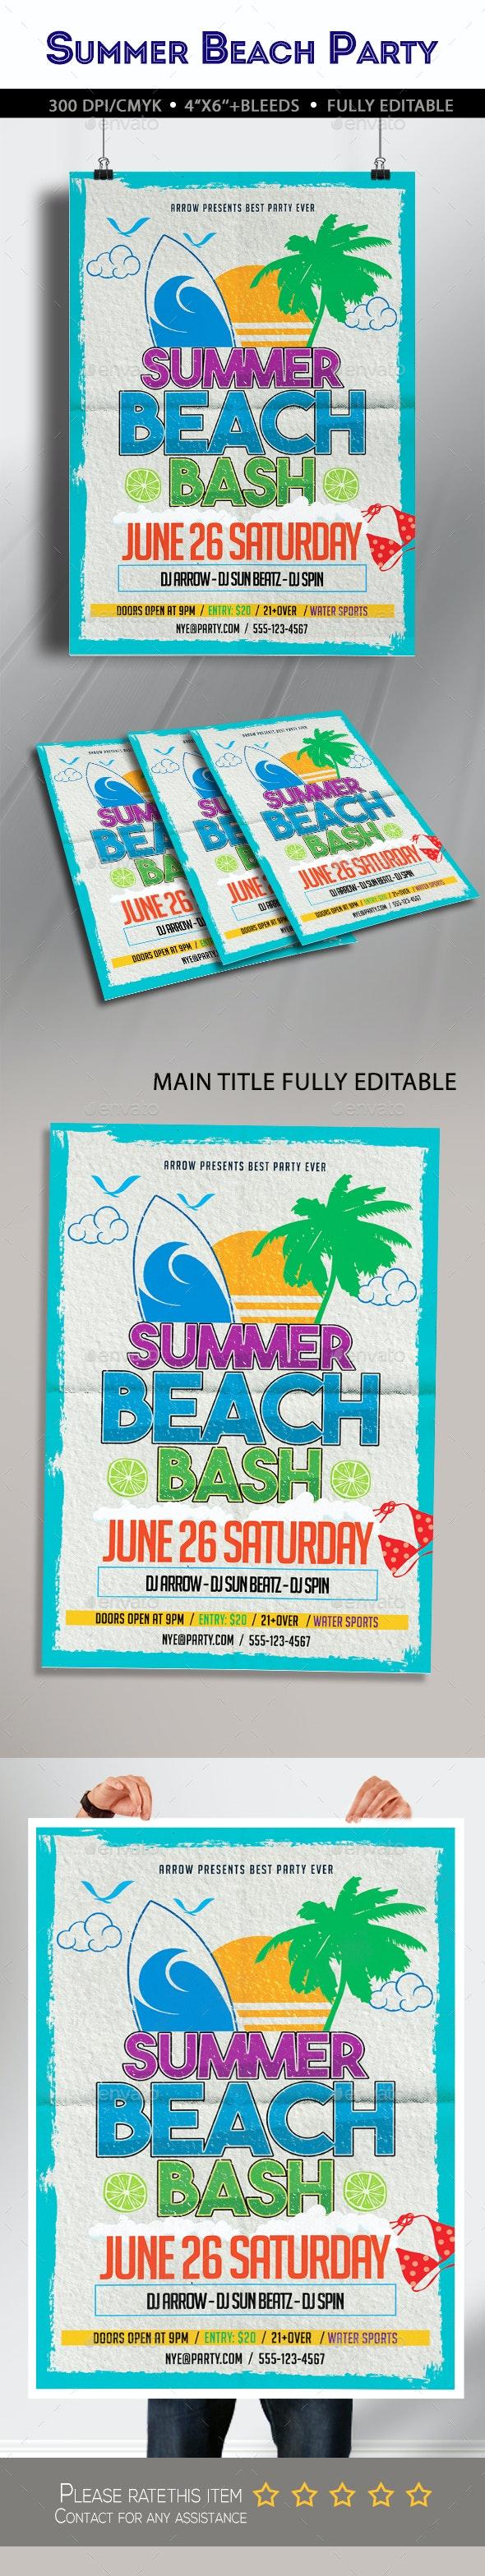 Summer Beach Bash Flyer - Clubs & Parties Events